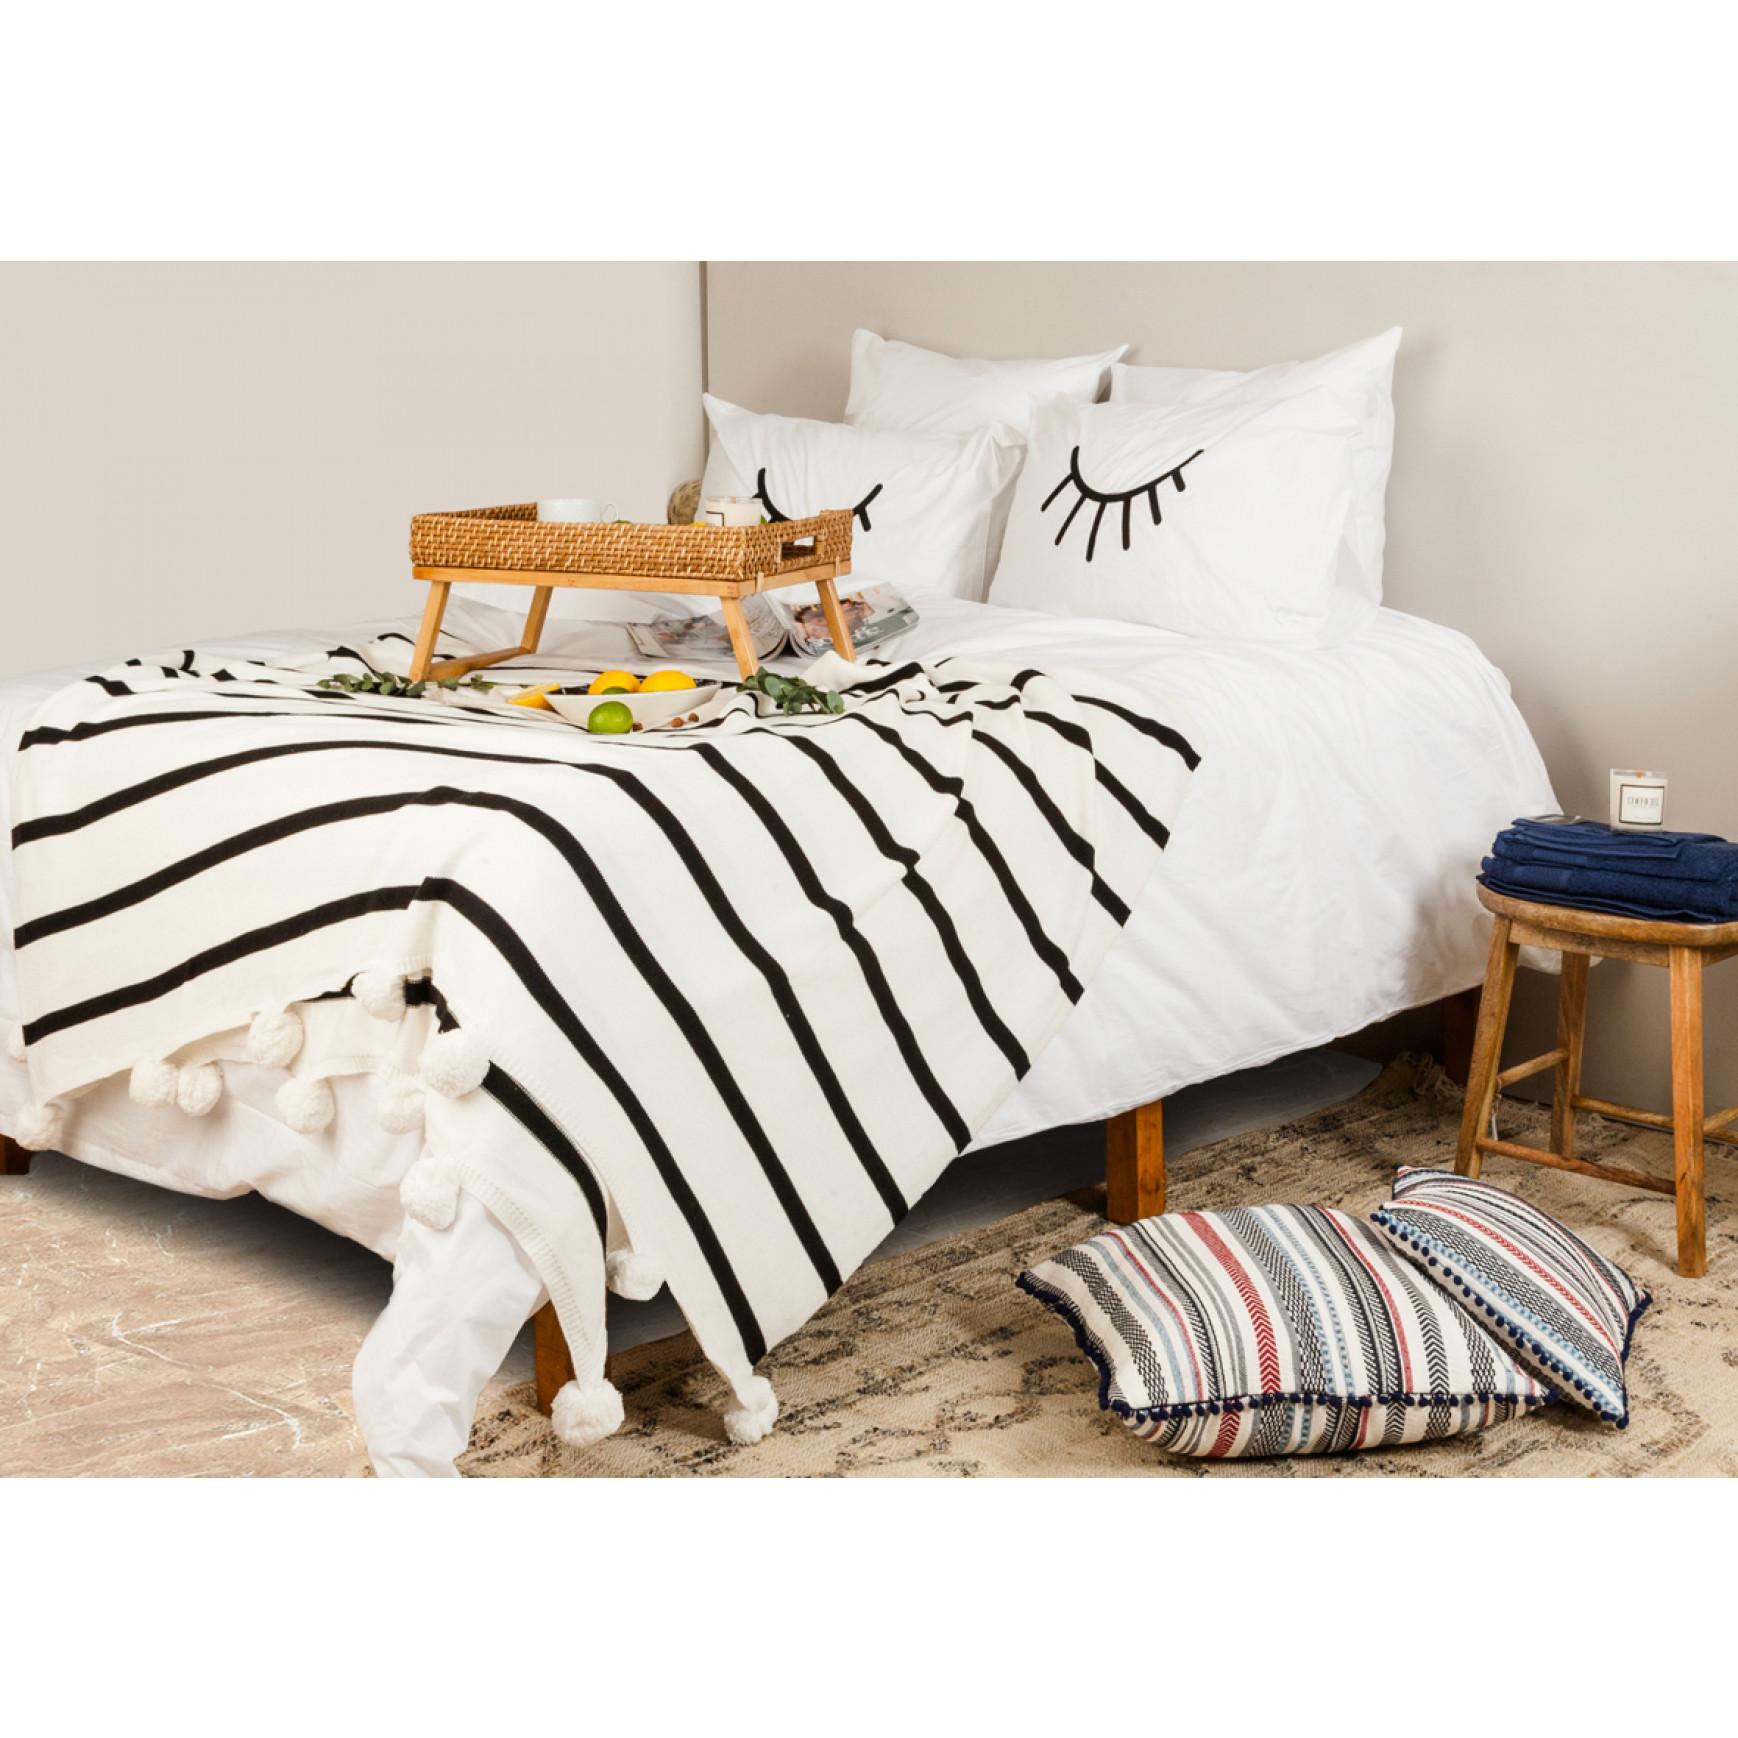 Bettbezug Les Essentiels Percal   Weiß-240x220cm